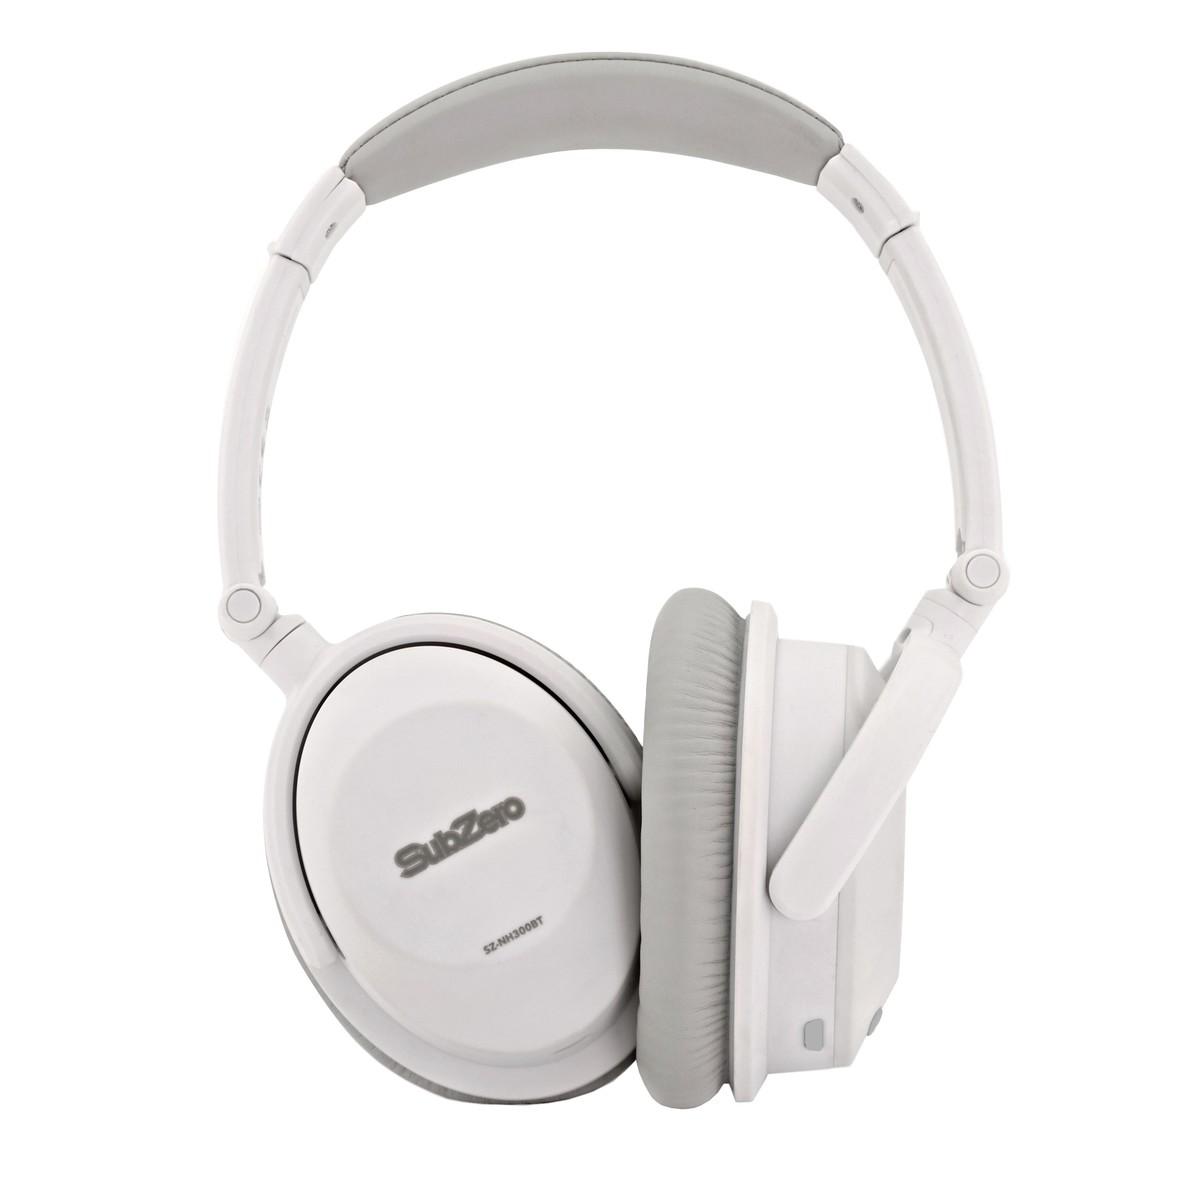 SubZero Wireless Bluetooth Noise Cancelling Headphones, White